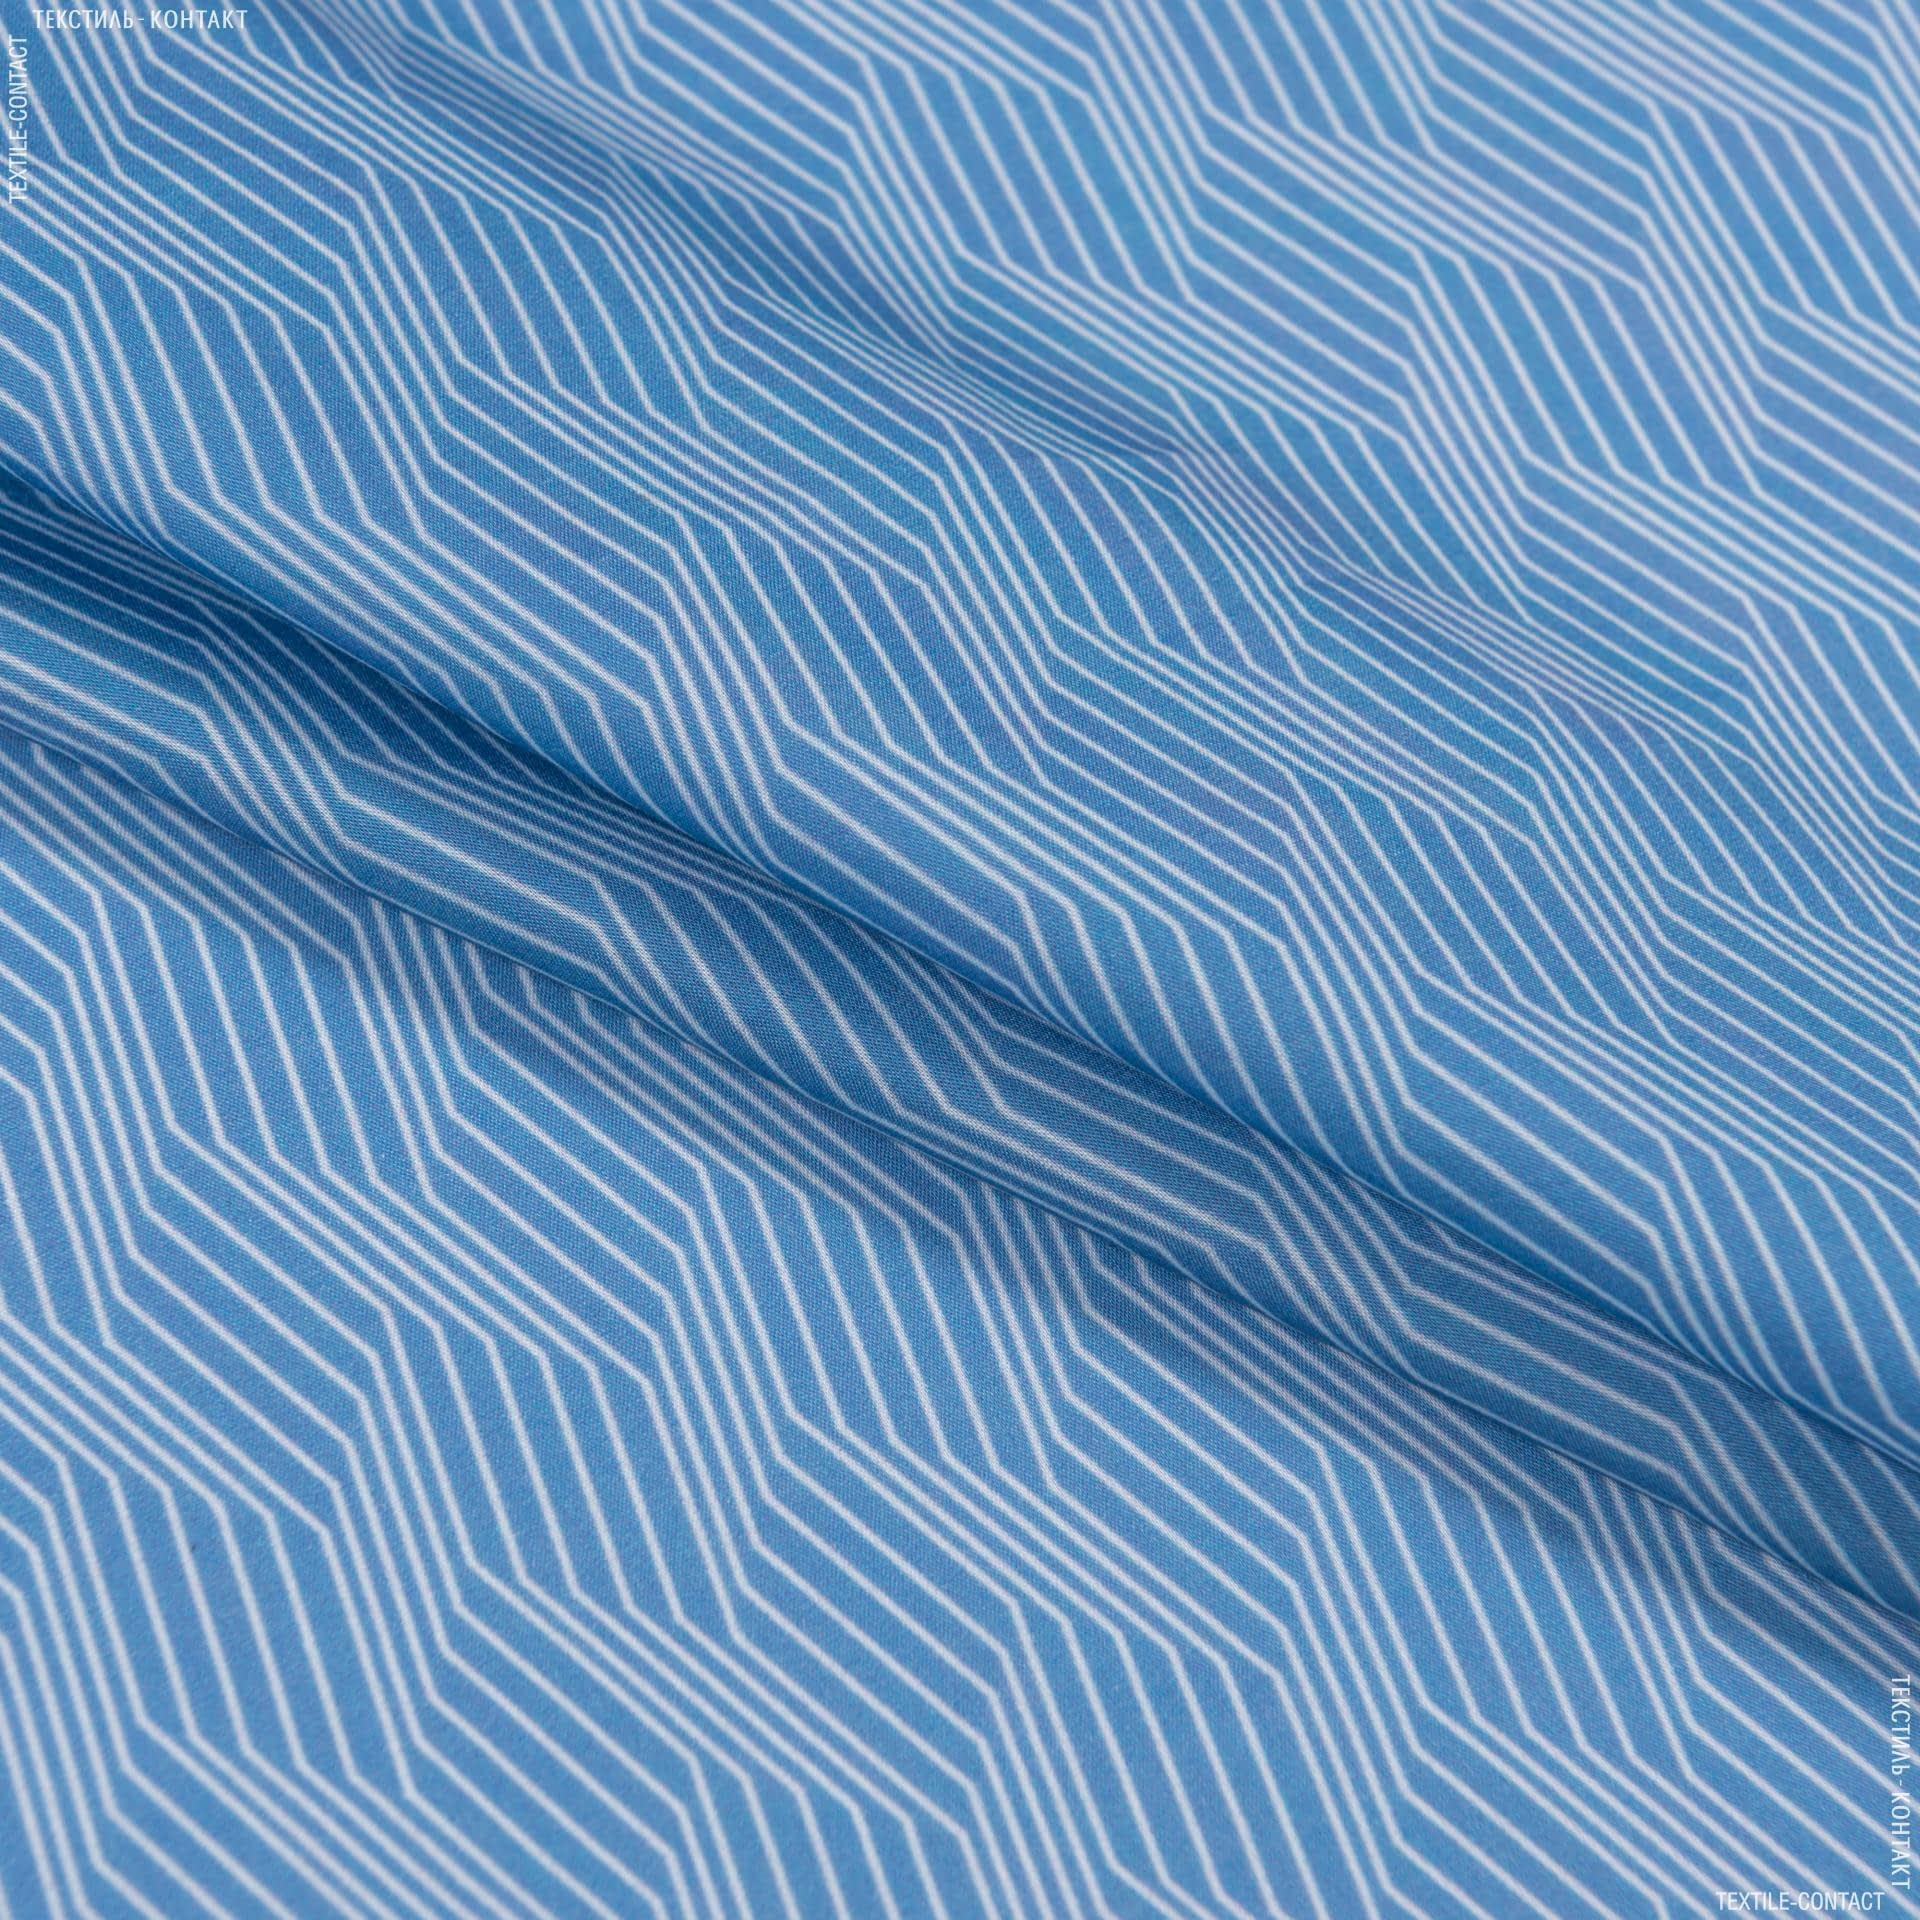 Ткани для платков и бандан - Батист принт